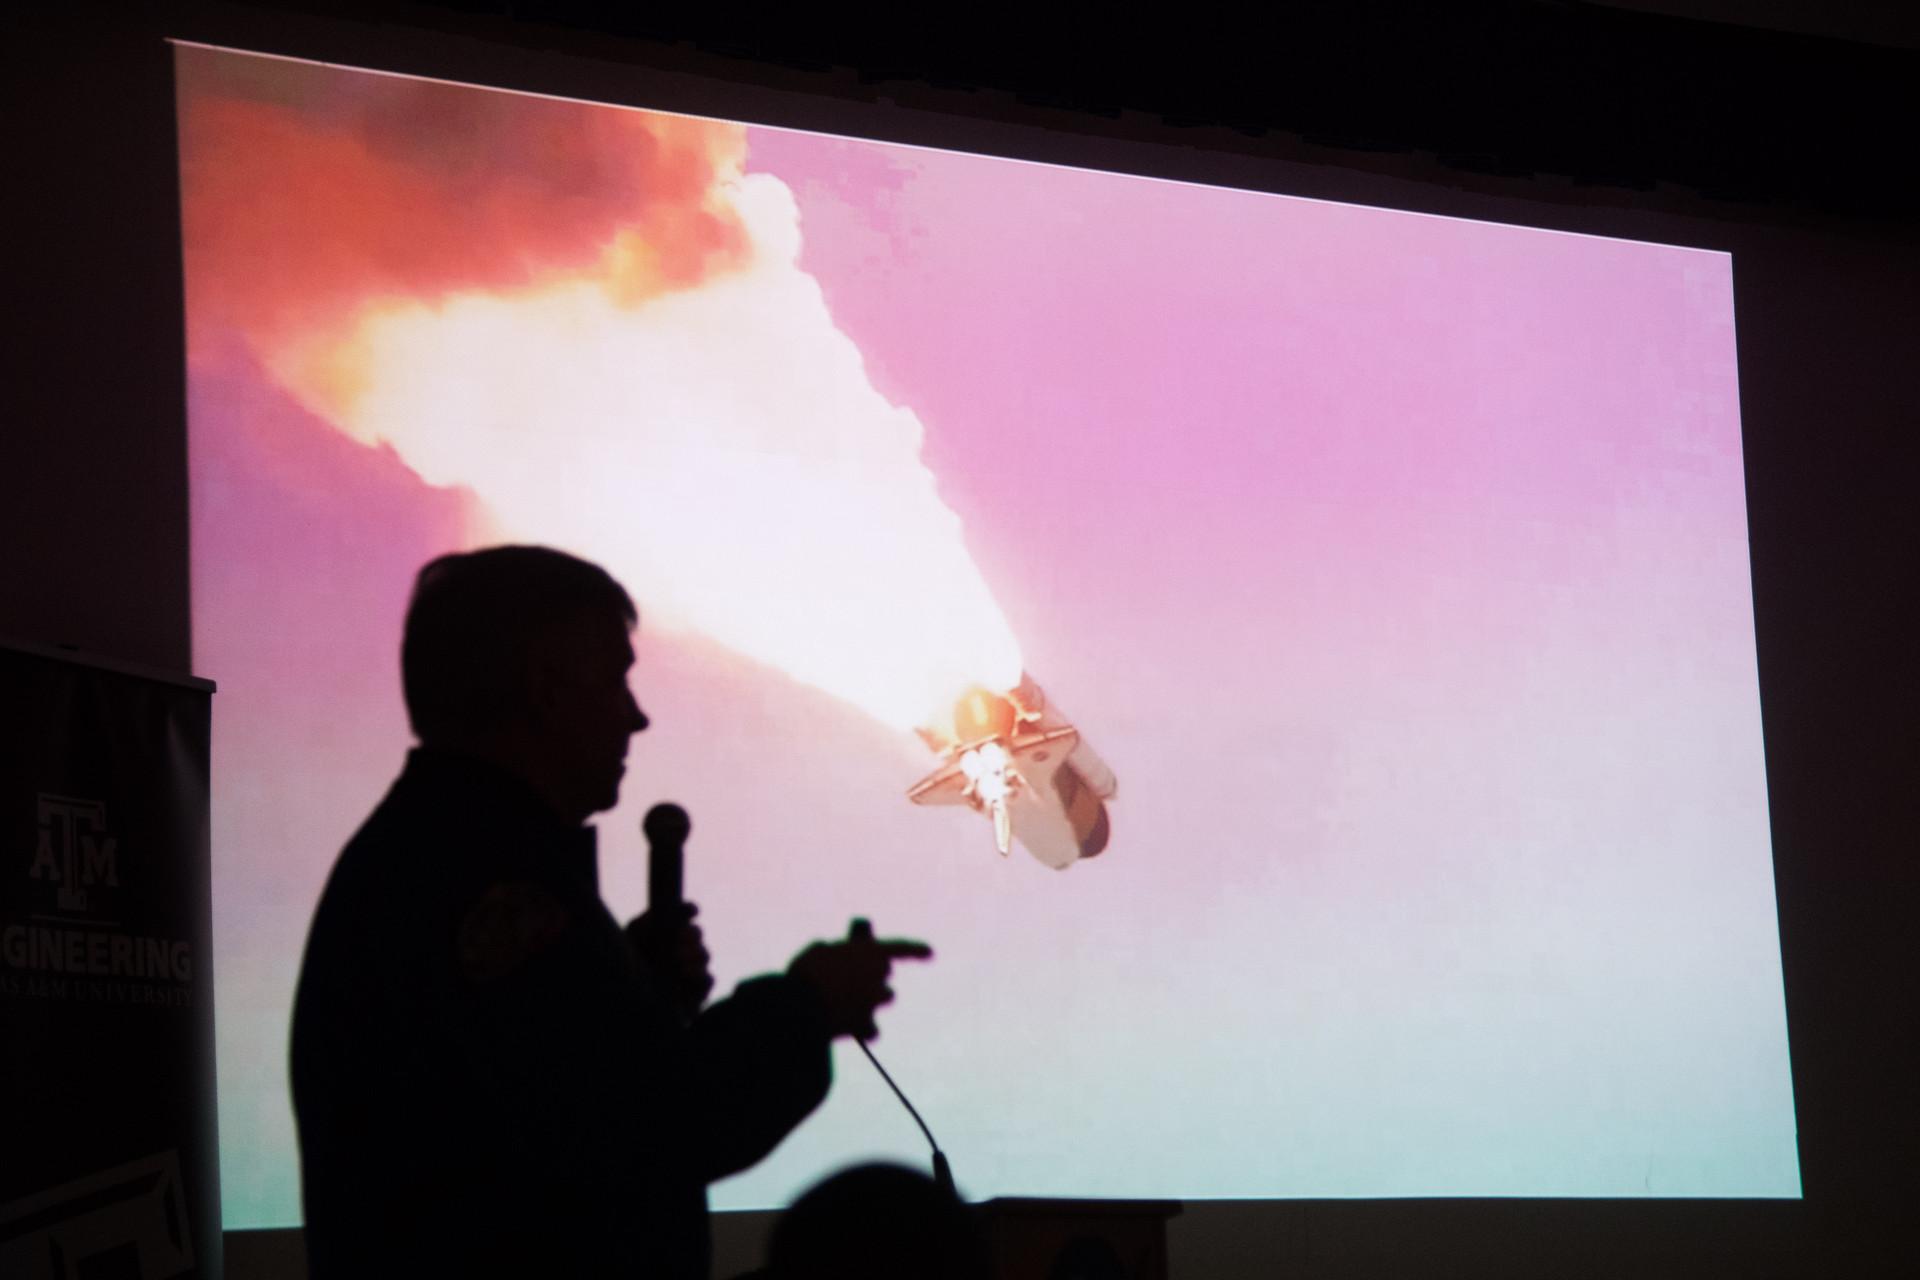 Retired Astronaut Greg Johnson speaks at the 2017 Zero Robotics Middle School Final Event